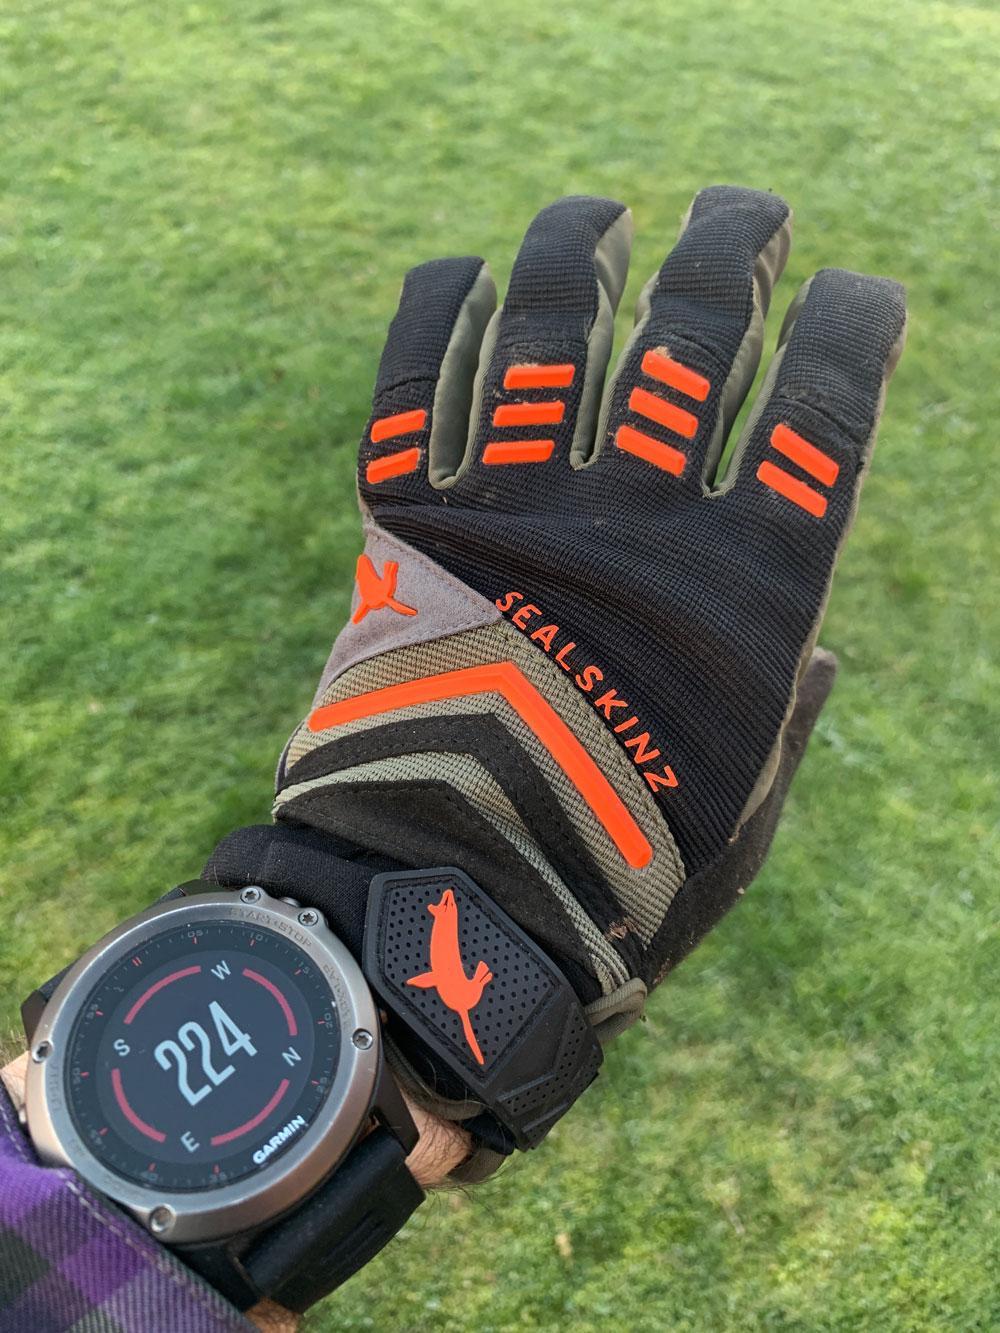 b1ab1036c7e53 Ridelines sealskinz dragon eye waterproof glove review jpg 1000x1333 Sealskinz  waterproof gloves review